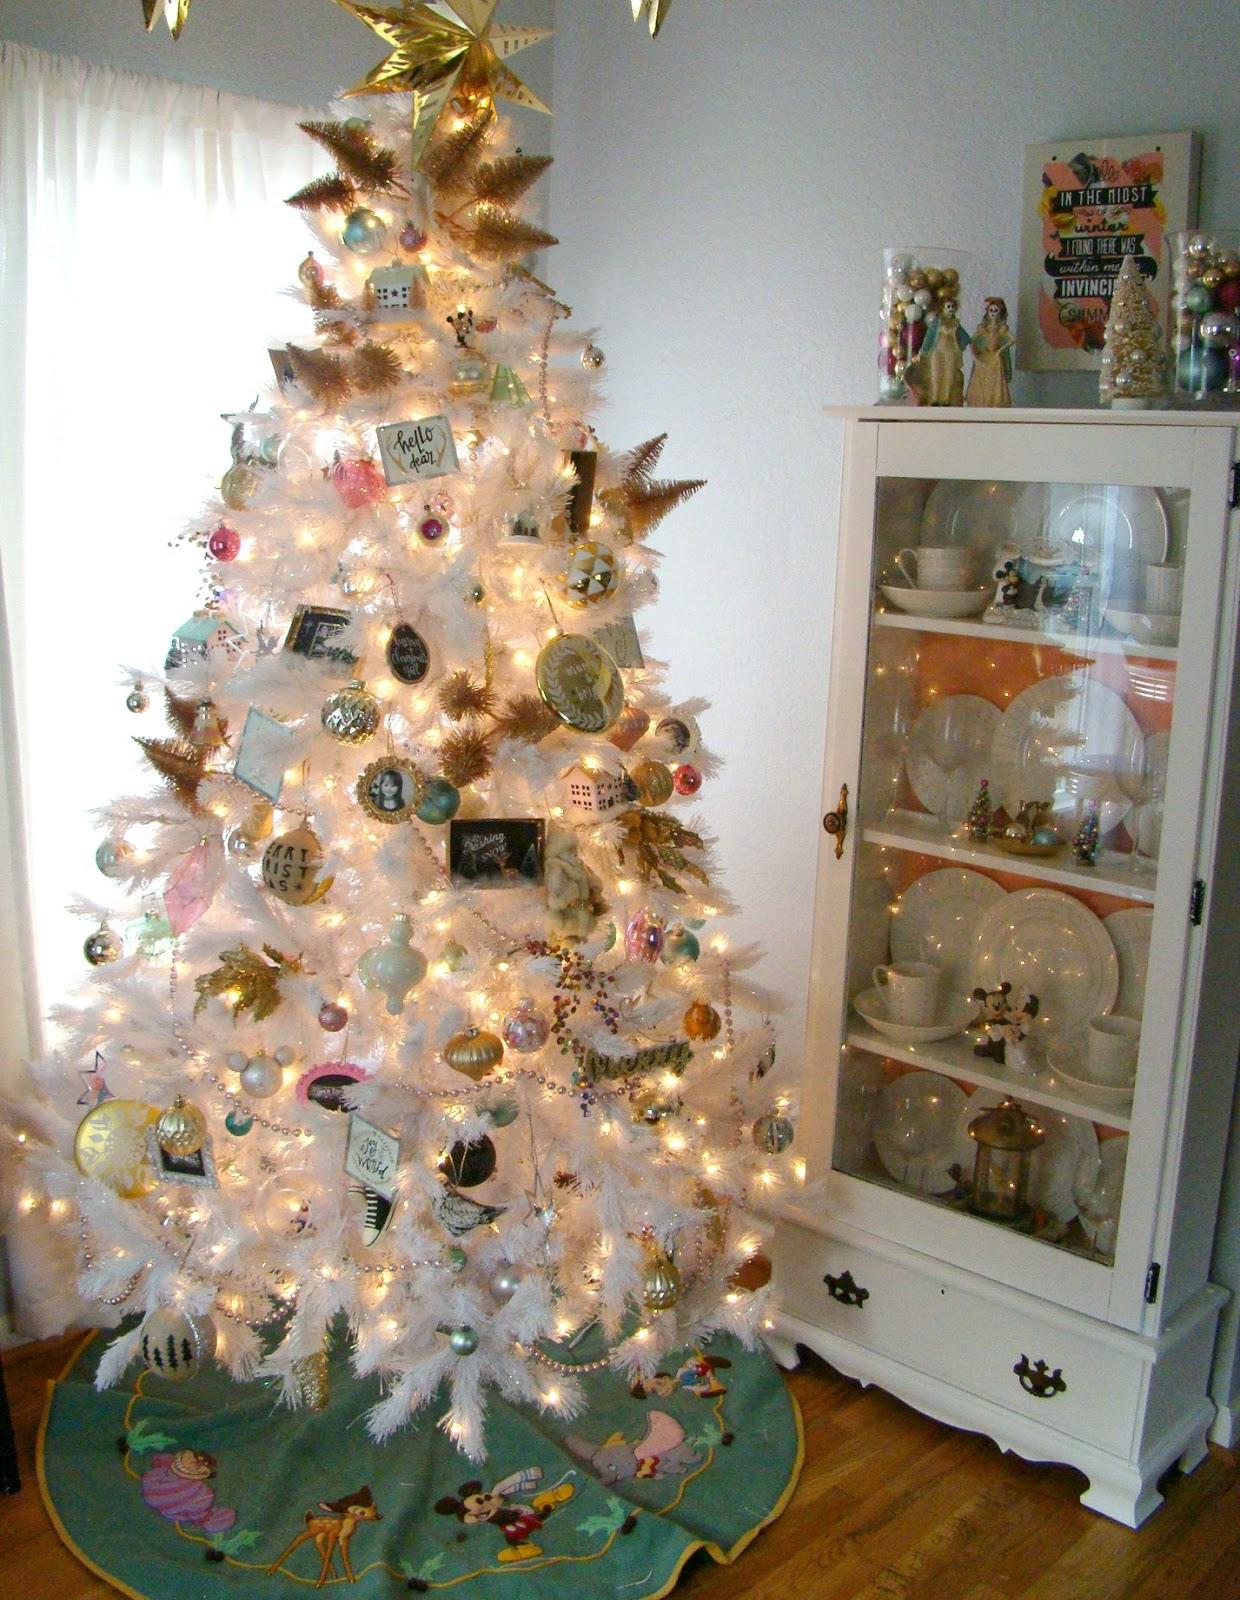 Decorate the christmas tree fa la la la - I Added A Cozy New Throw A Tree And Various Ball Ornaments And Fa La La La La It S Christmas